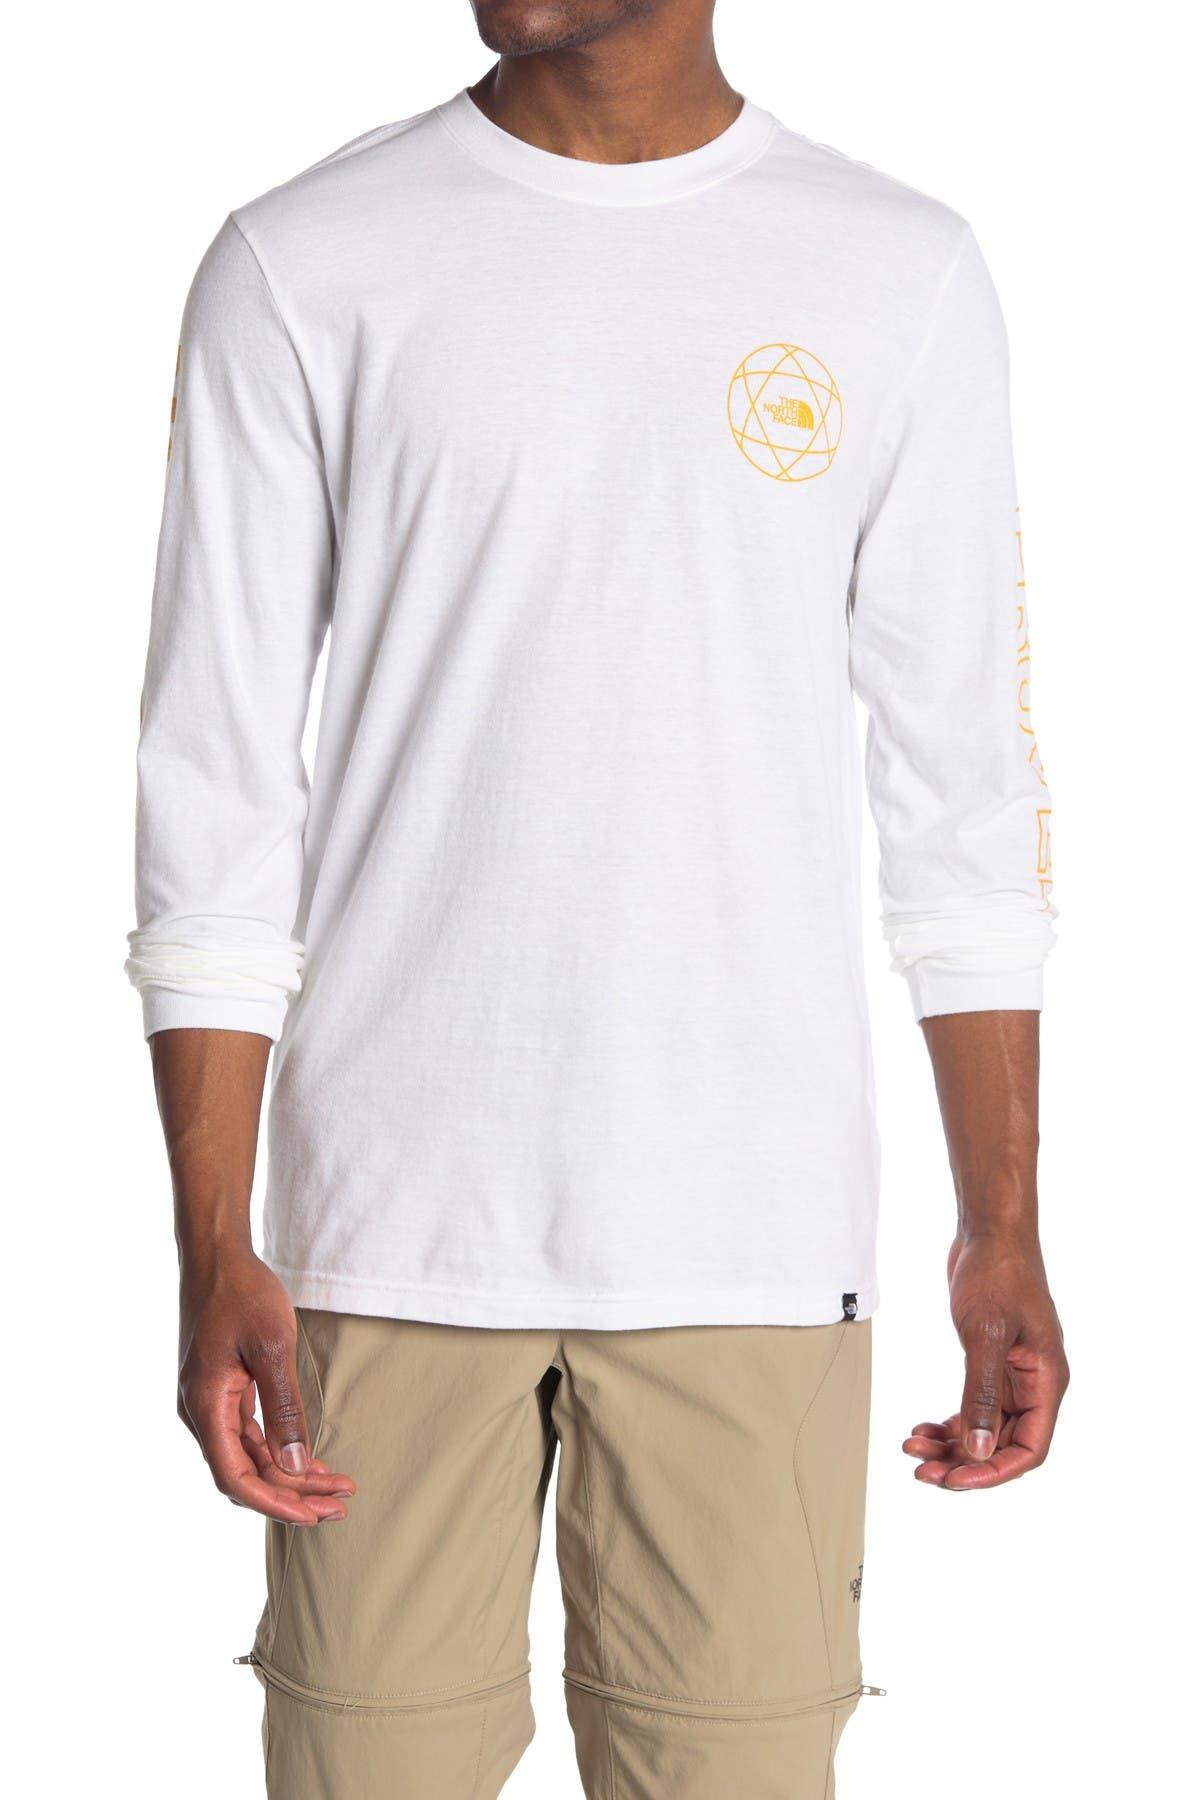 Image of The North Face Logo Print Long Sleeve T-Shirt